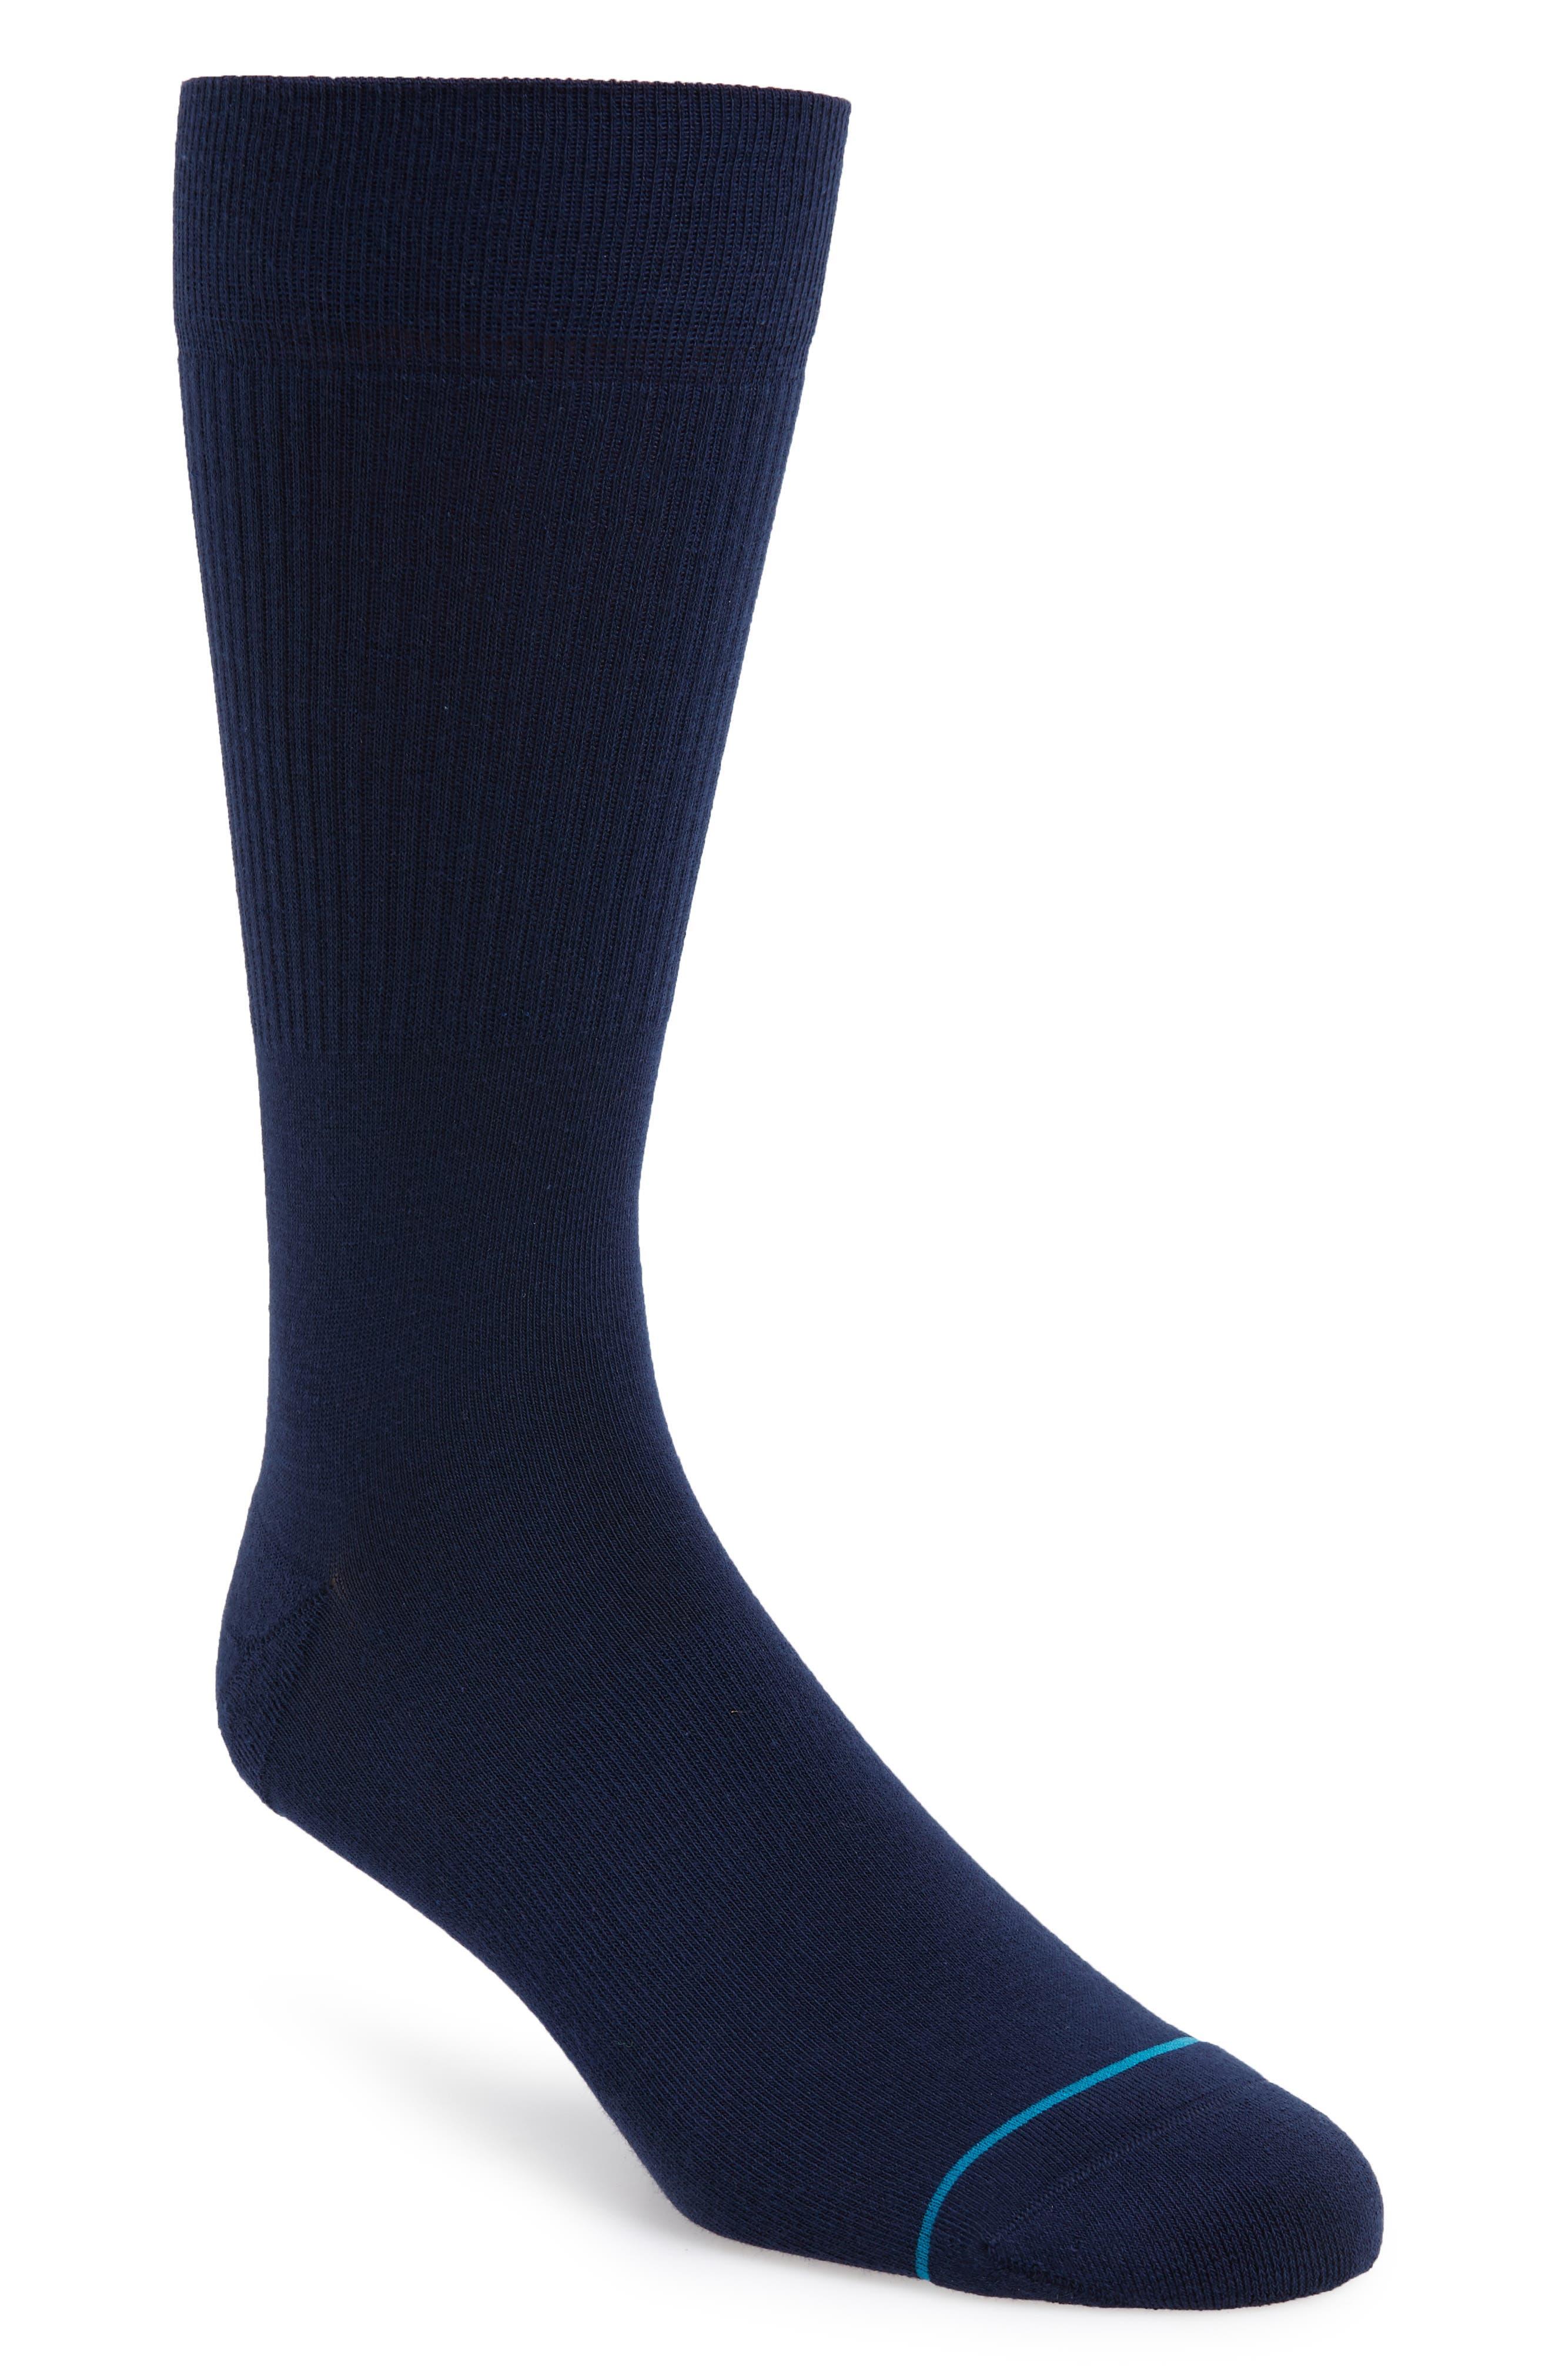 Fashion Icon Crew Socks,                         Main,                         color, NAVY